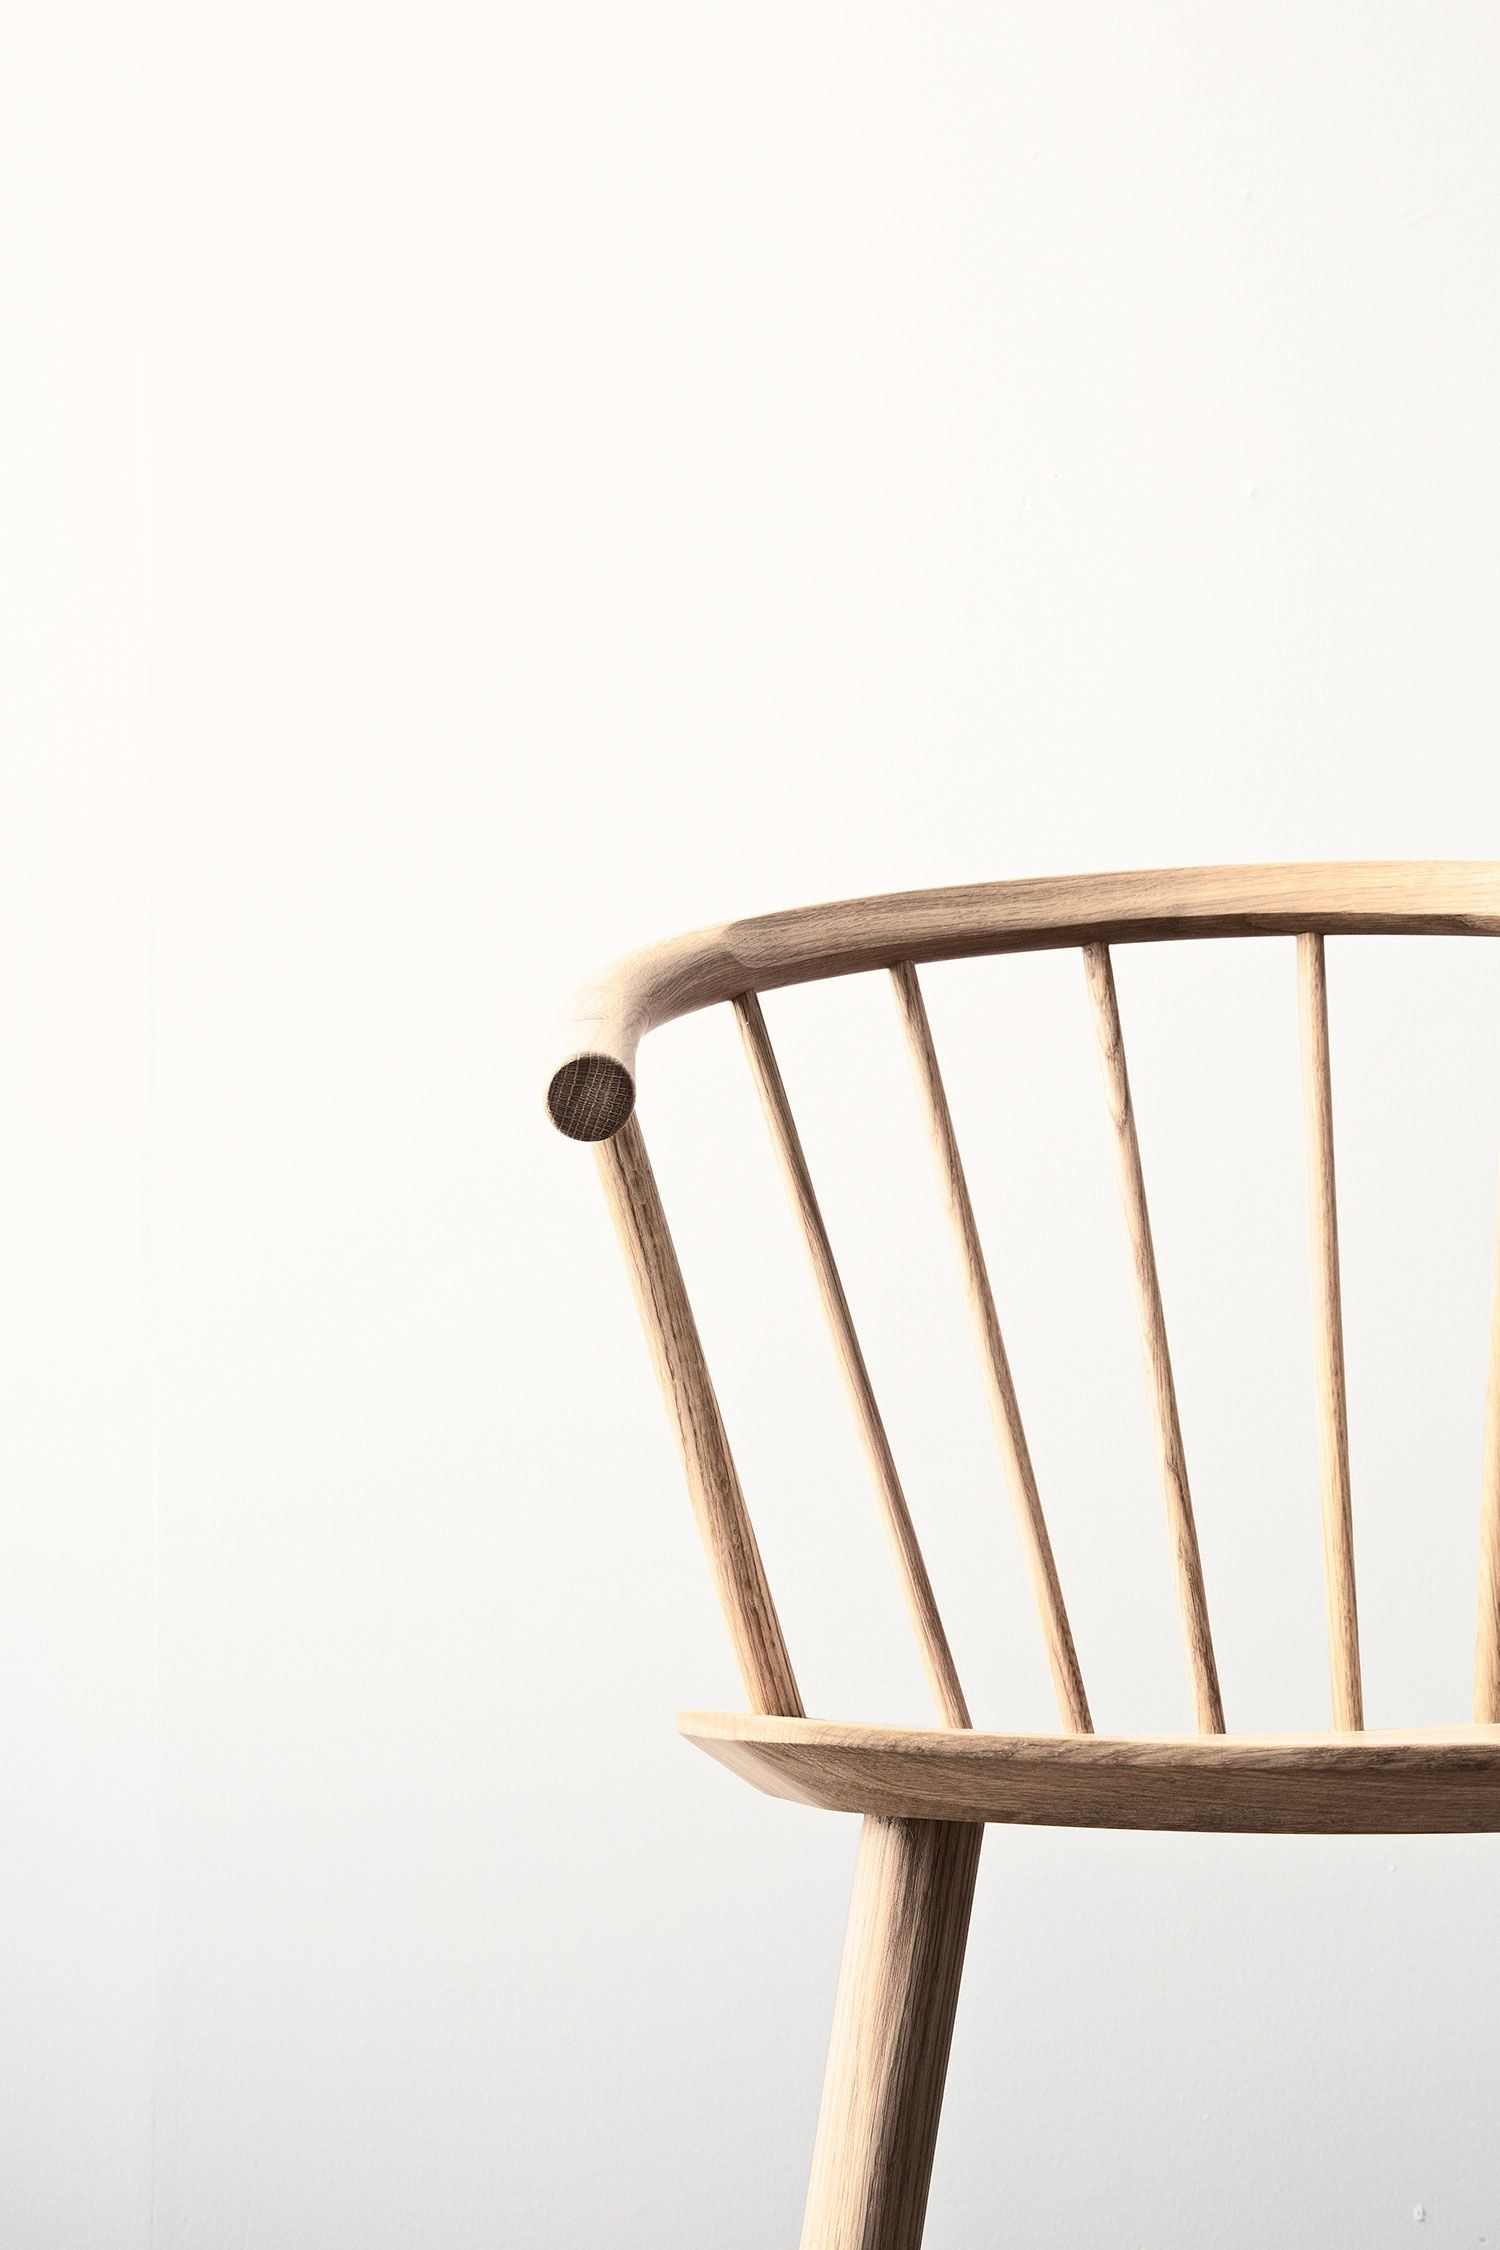 Sleek Chair, Bolia.com | Bo | Pinterest | Stuhl und Leidenschaft